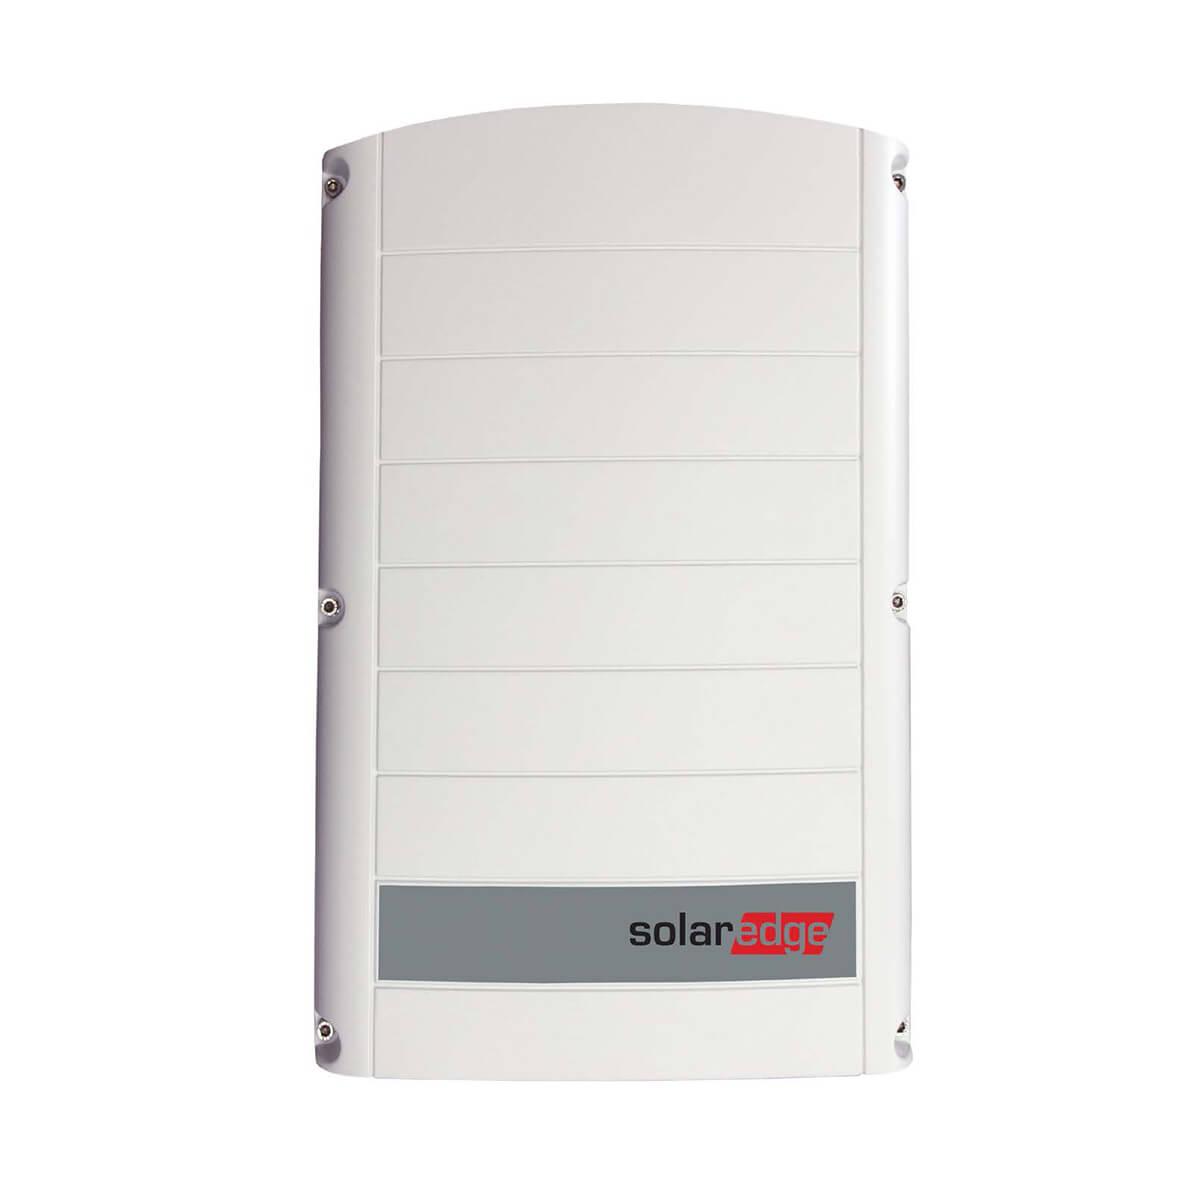 solaredge 7kW inverter, solaredge se7k 7kW inverter, solaredge se7k inverter, solaredge se7k, solaredge 7 kW